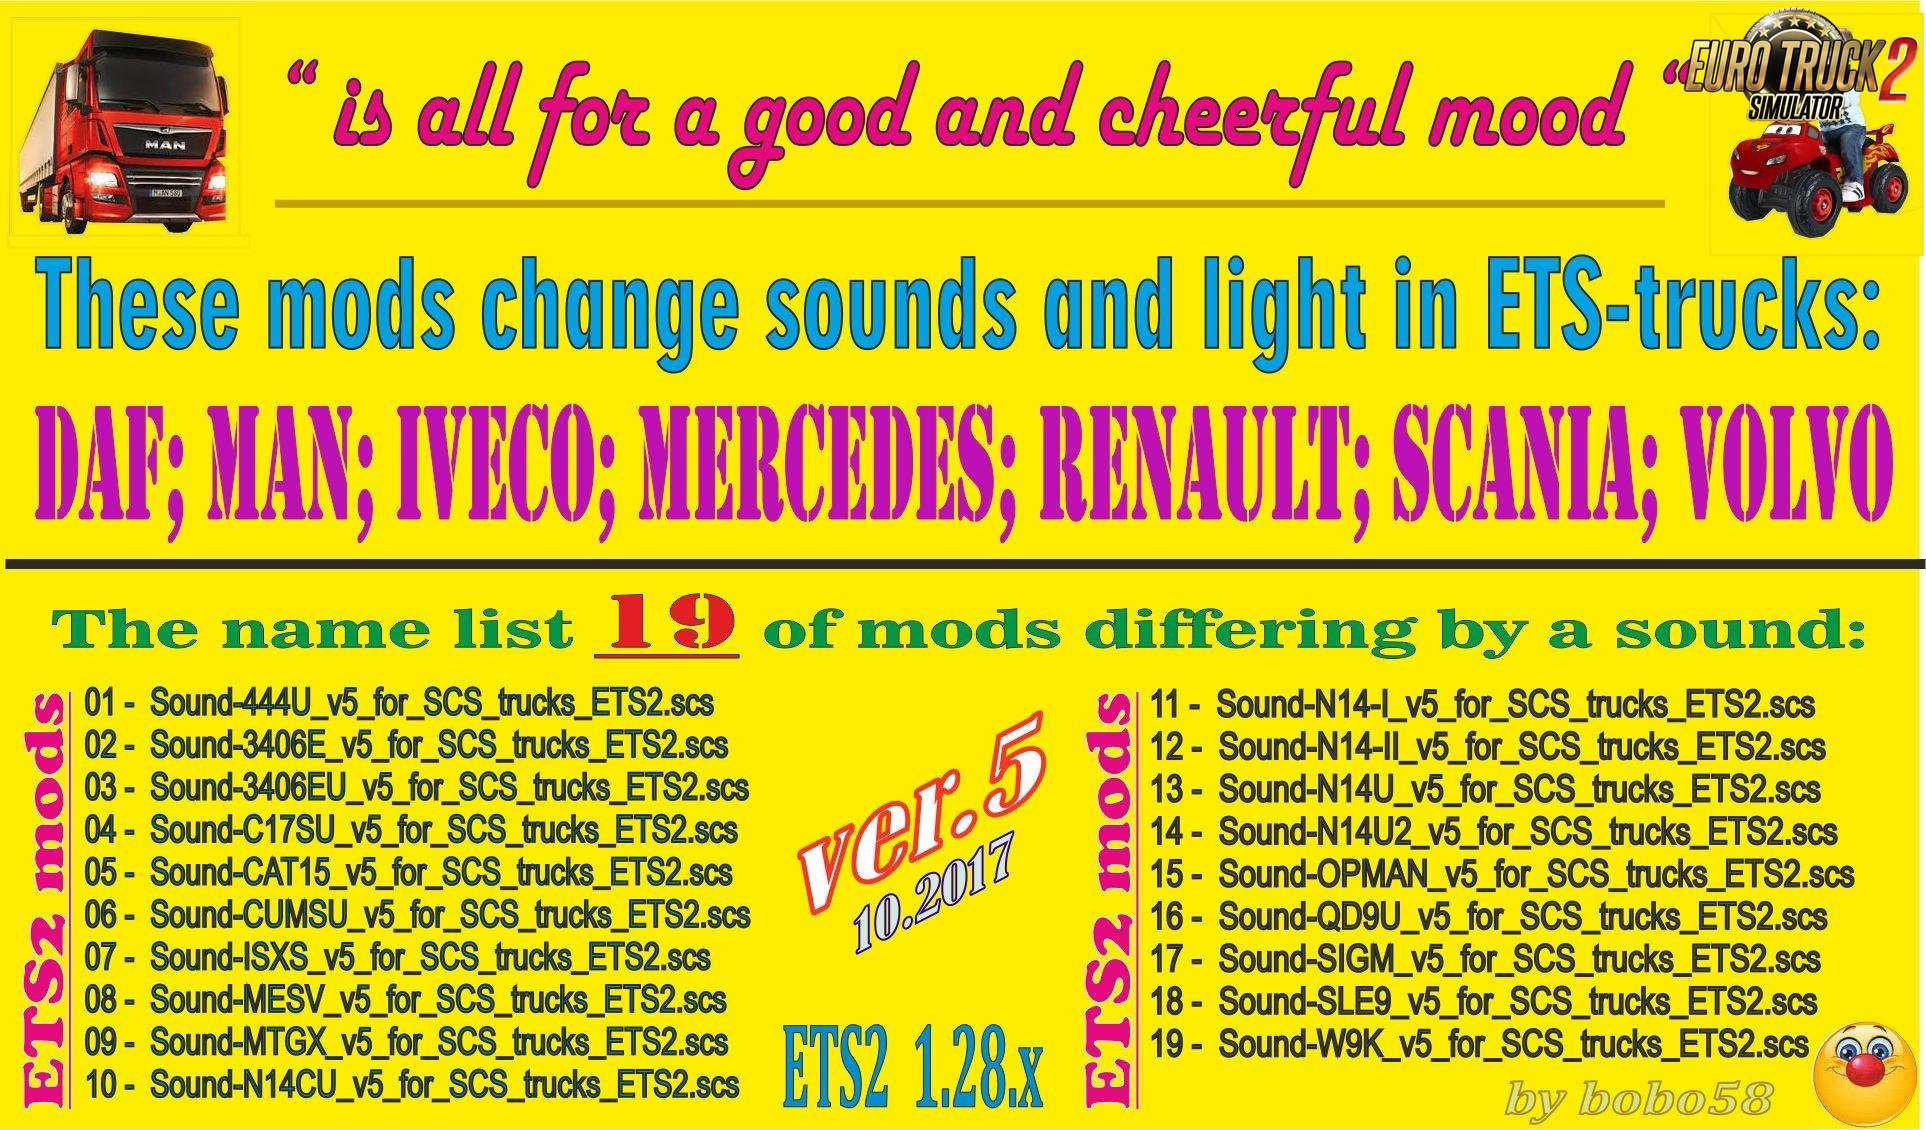 Sound mod for trucks ets2 v5.0 by bobo58